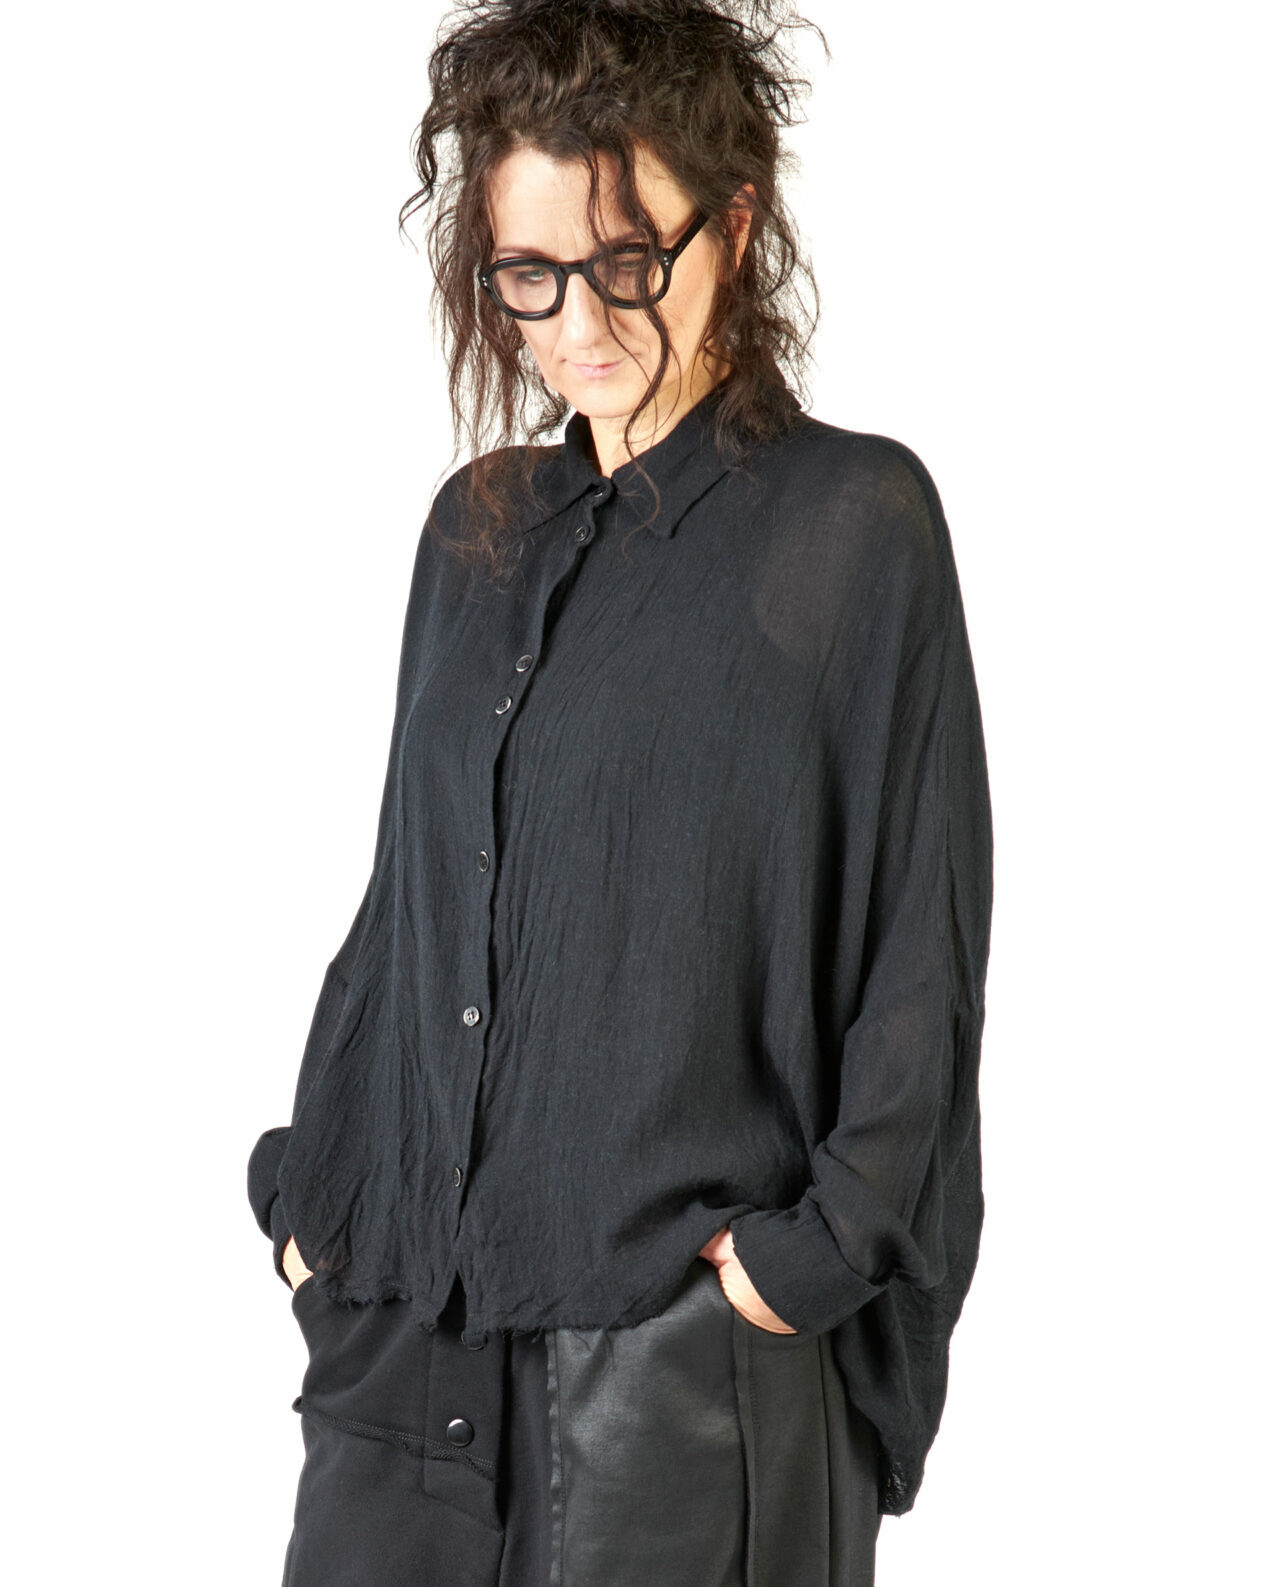 MOONA shirt